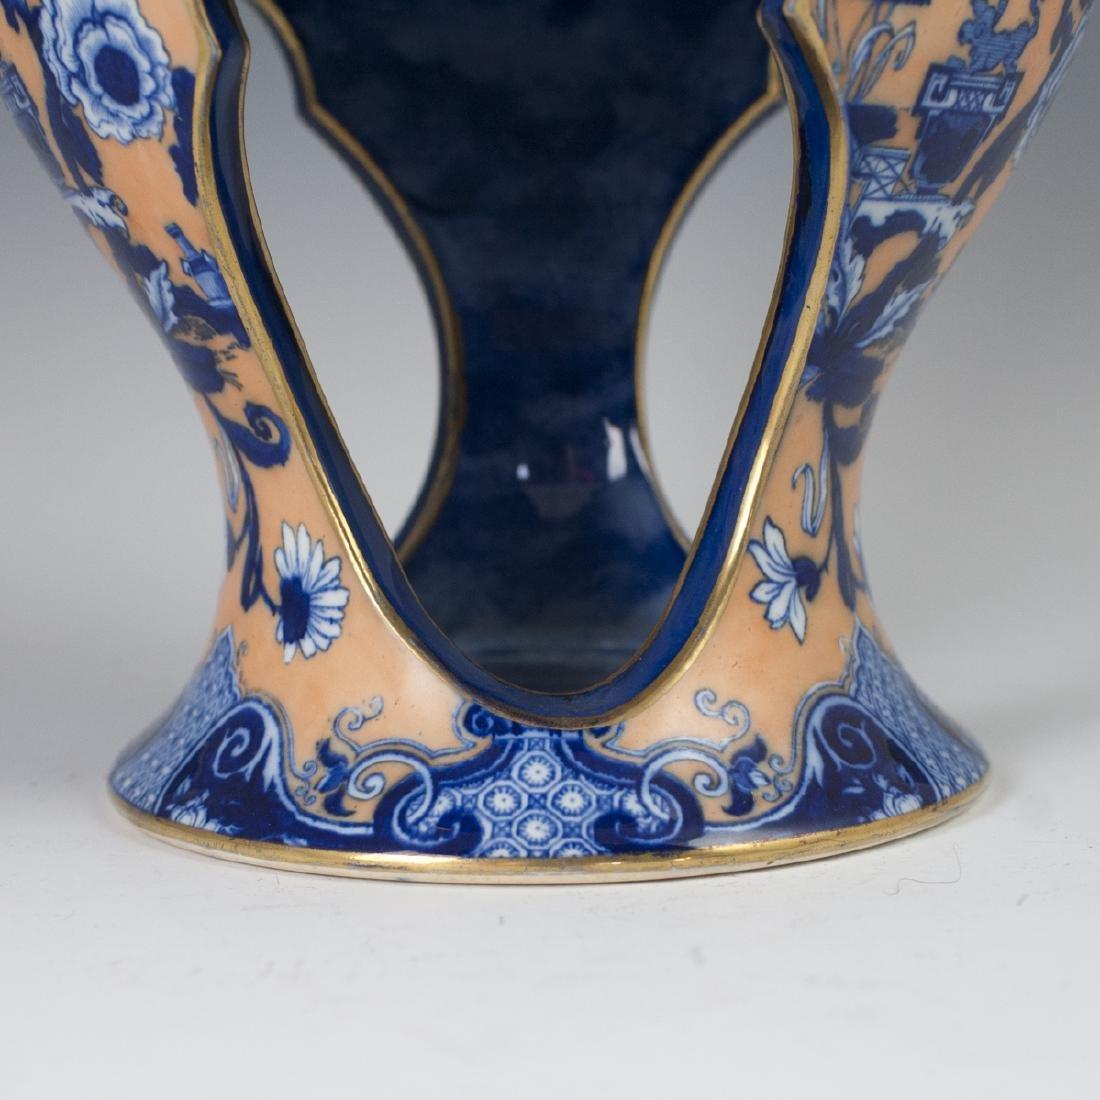 Doulton Burslem Porcelain Vase - 2